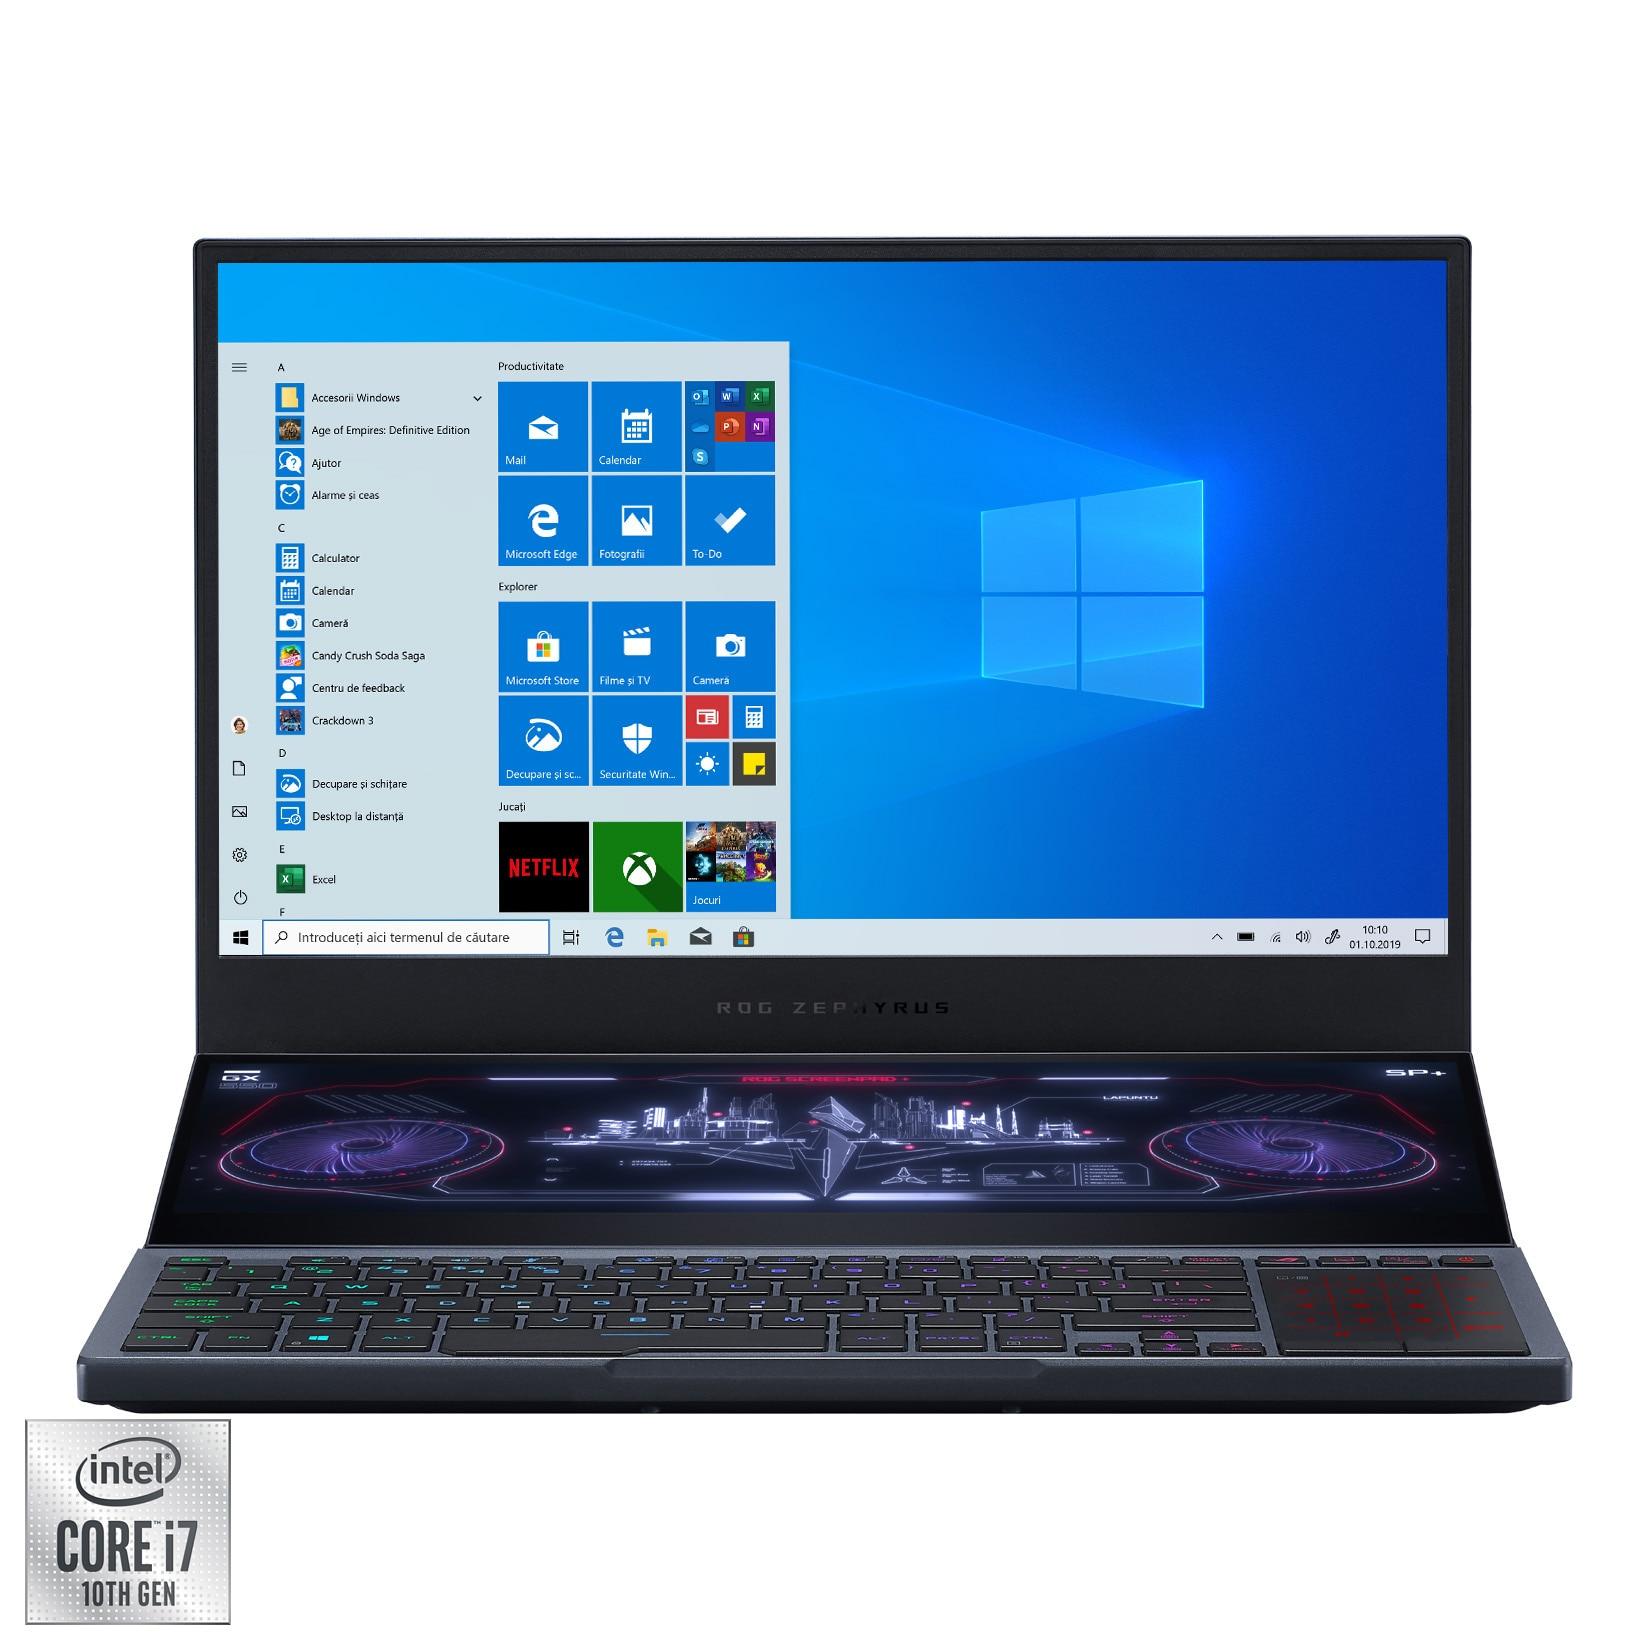 "Fotografie Laptop Gaming ASUS ROG Zephyrus Duo 15 GX550LWS cu procesor Intel® Core™ i7-10875H pana la 5.10 GHz, 15.6"", Full HD, 300Hz, 32GB, 1TB SSD, NVIDIA® GeForce® RTX 2070 SUPER™ Max-Q 8GB, Windows 10 Pro, Gunmetal Gray"